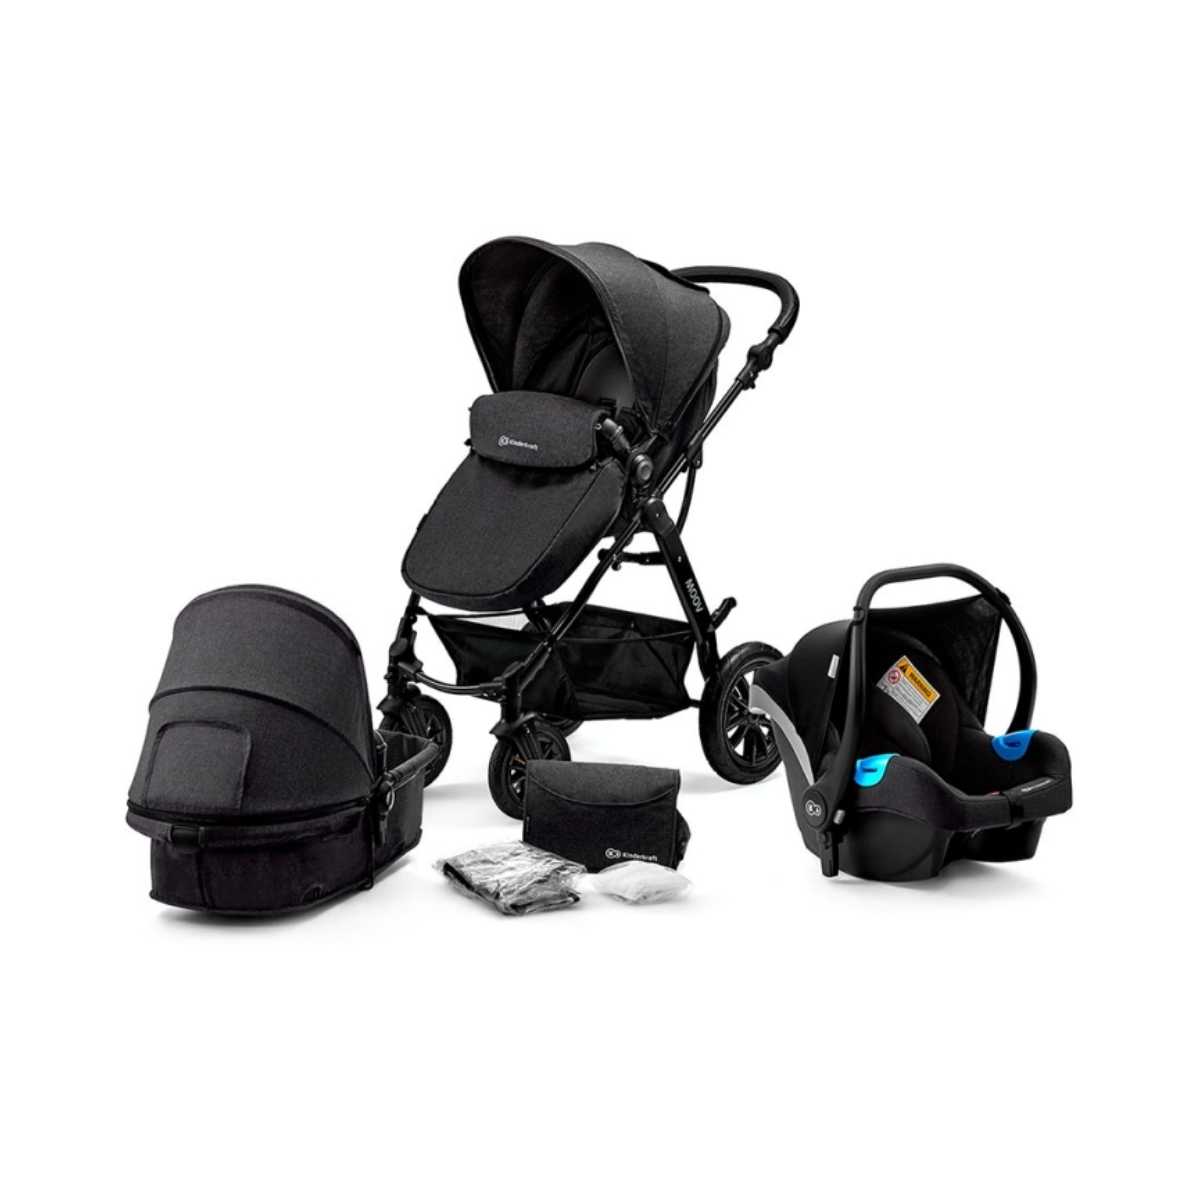 Kinderkraft Moov 3in1 Travel System-Black